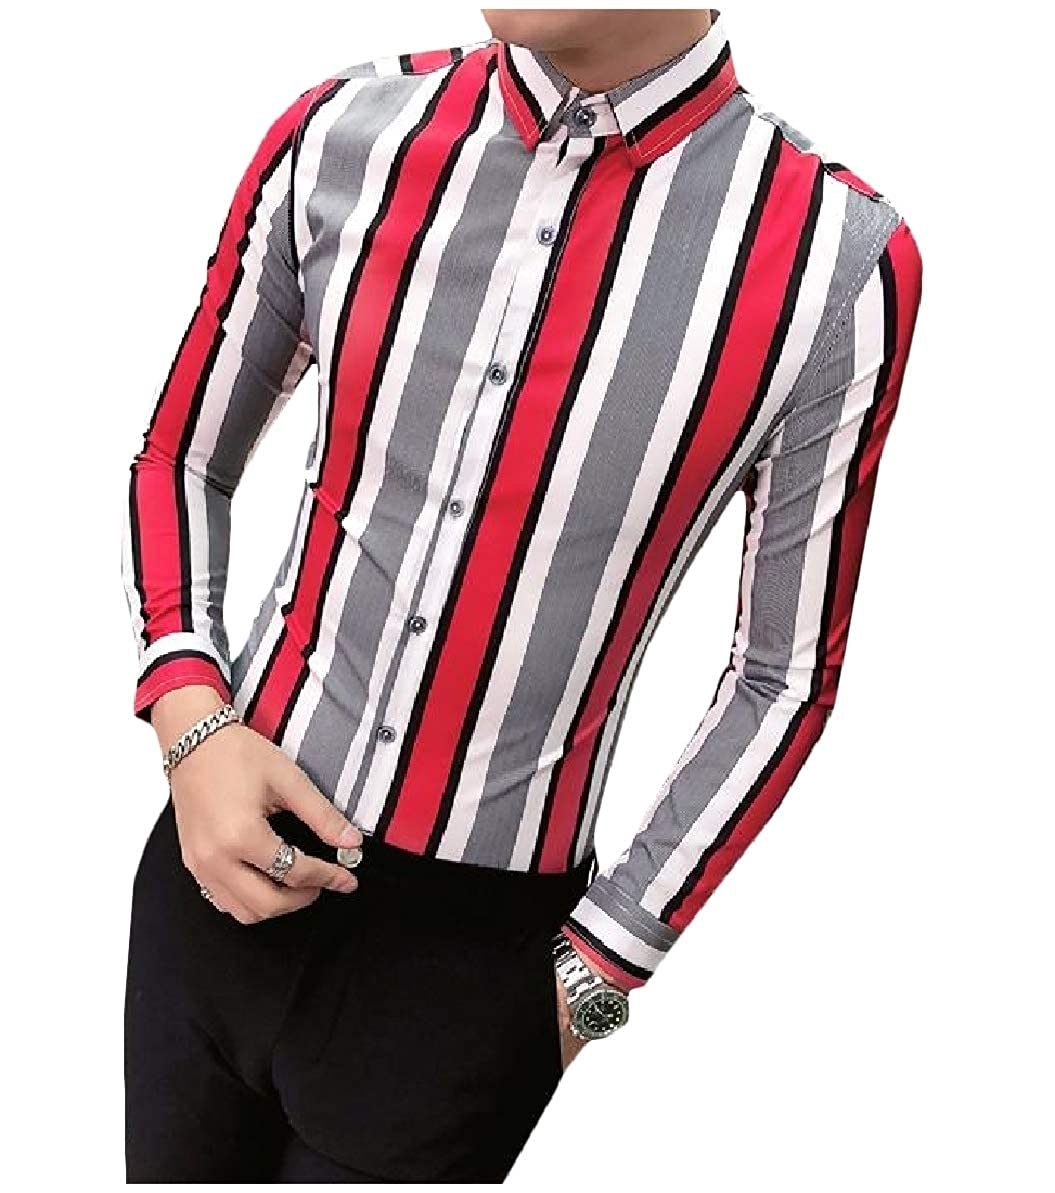 Zimaes-Men Silm Fit Striped Peaked Collar Nightclub Long Sleeve Shirt